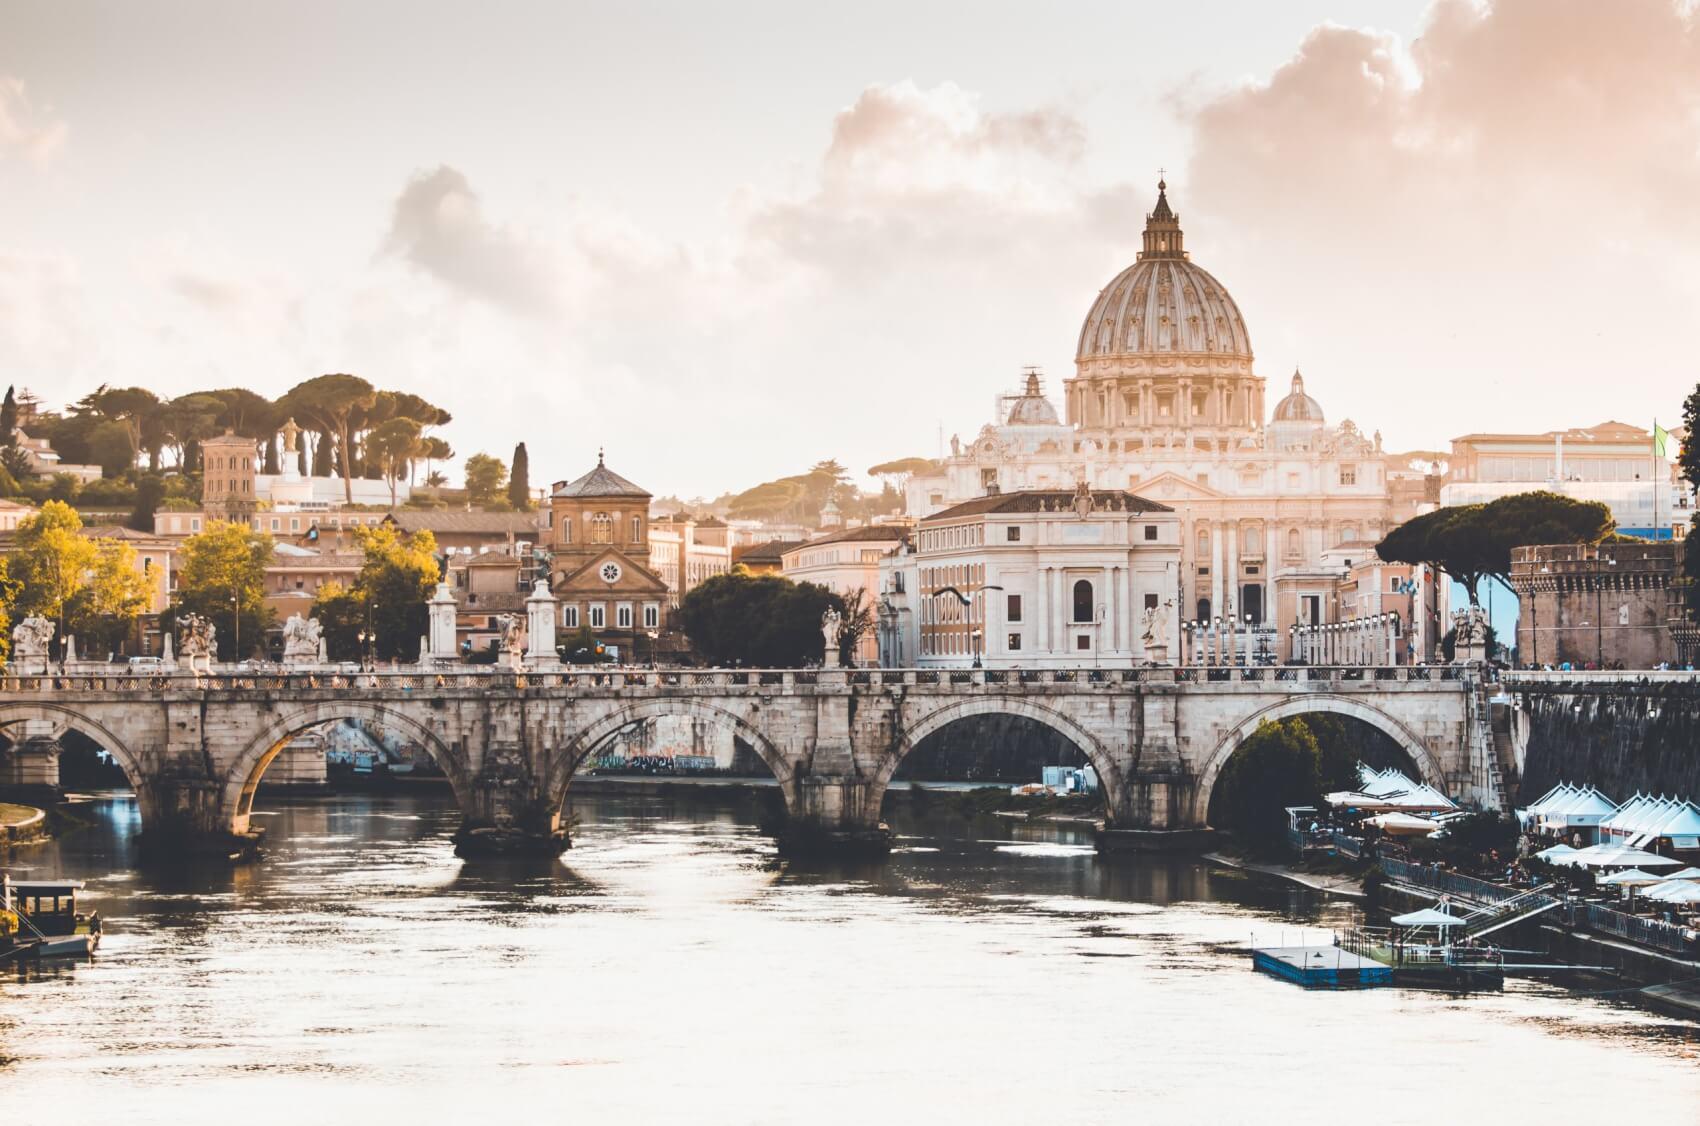 Rome Italy half term holiday deals